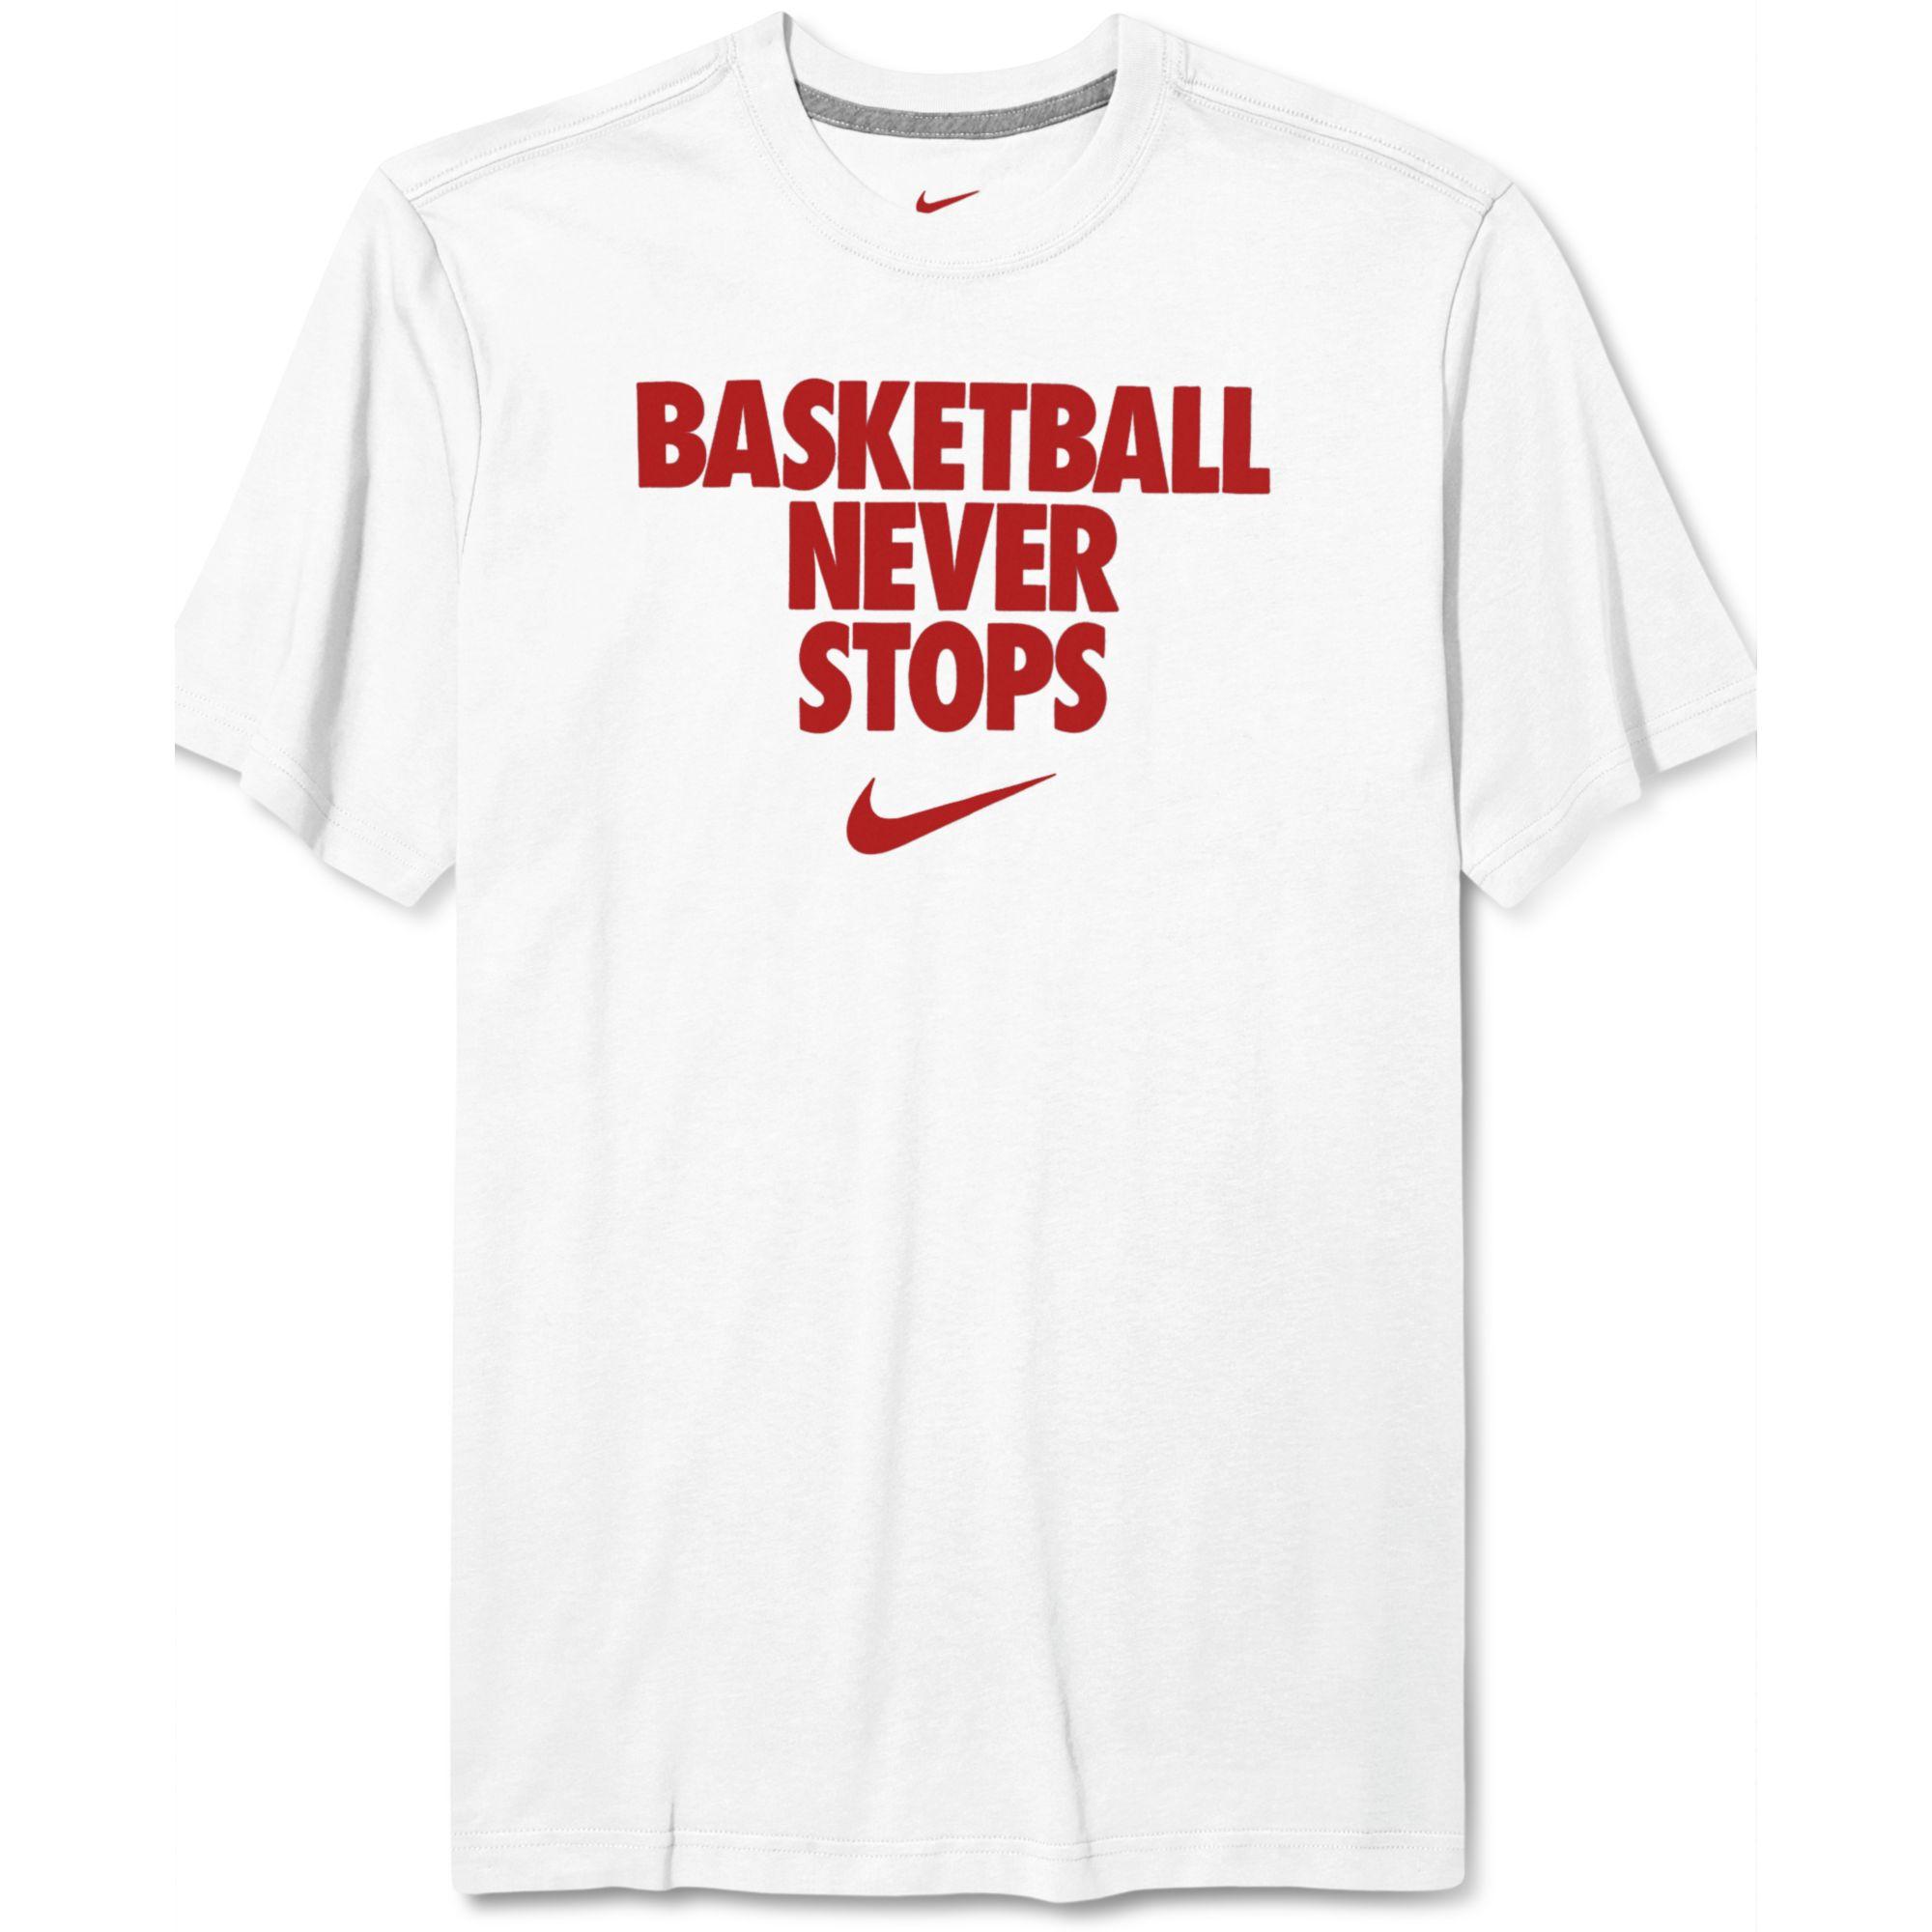 54f06b35ab86 Nike Shirts With Sayings For Basketball – EDGE Engineering and ...